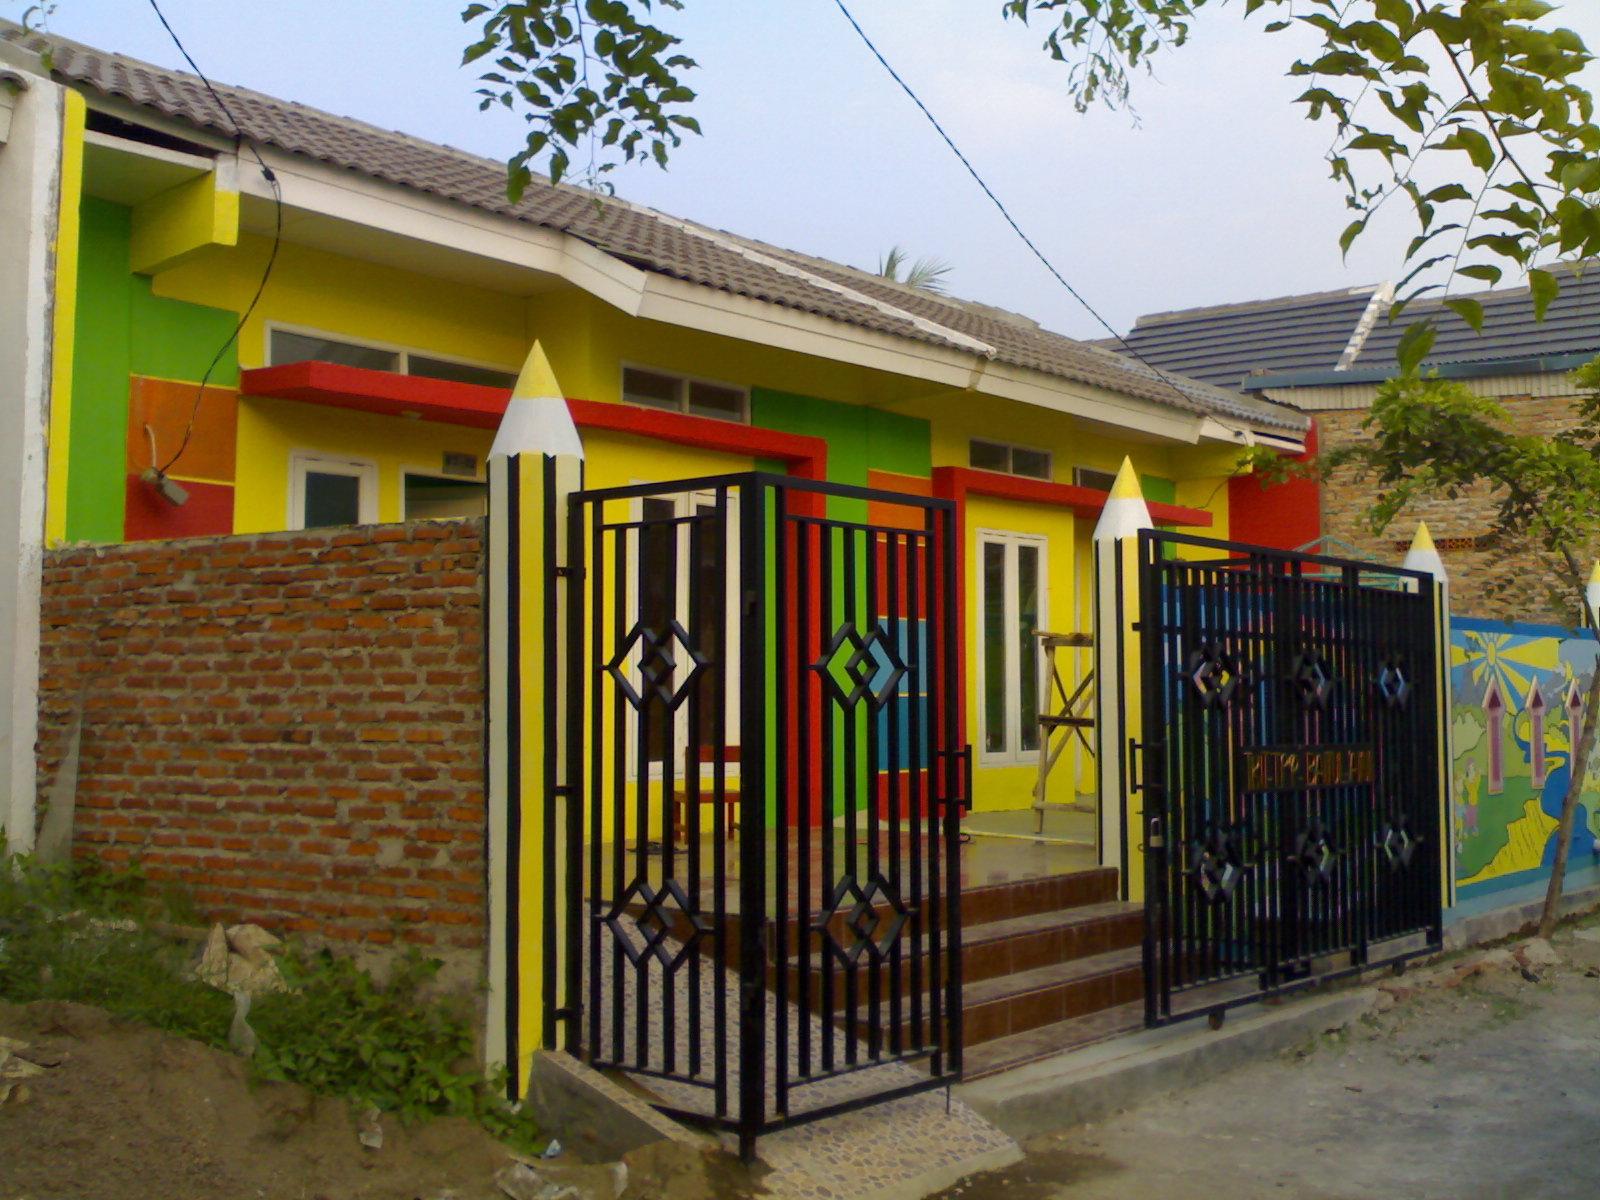 TKIT TPQ BAITUL AINI Tampak Depan Gedung Sekolah Taman Kanak